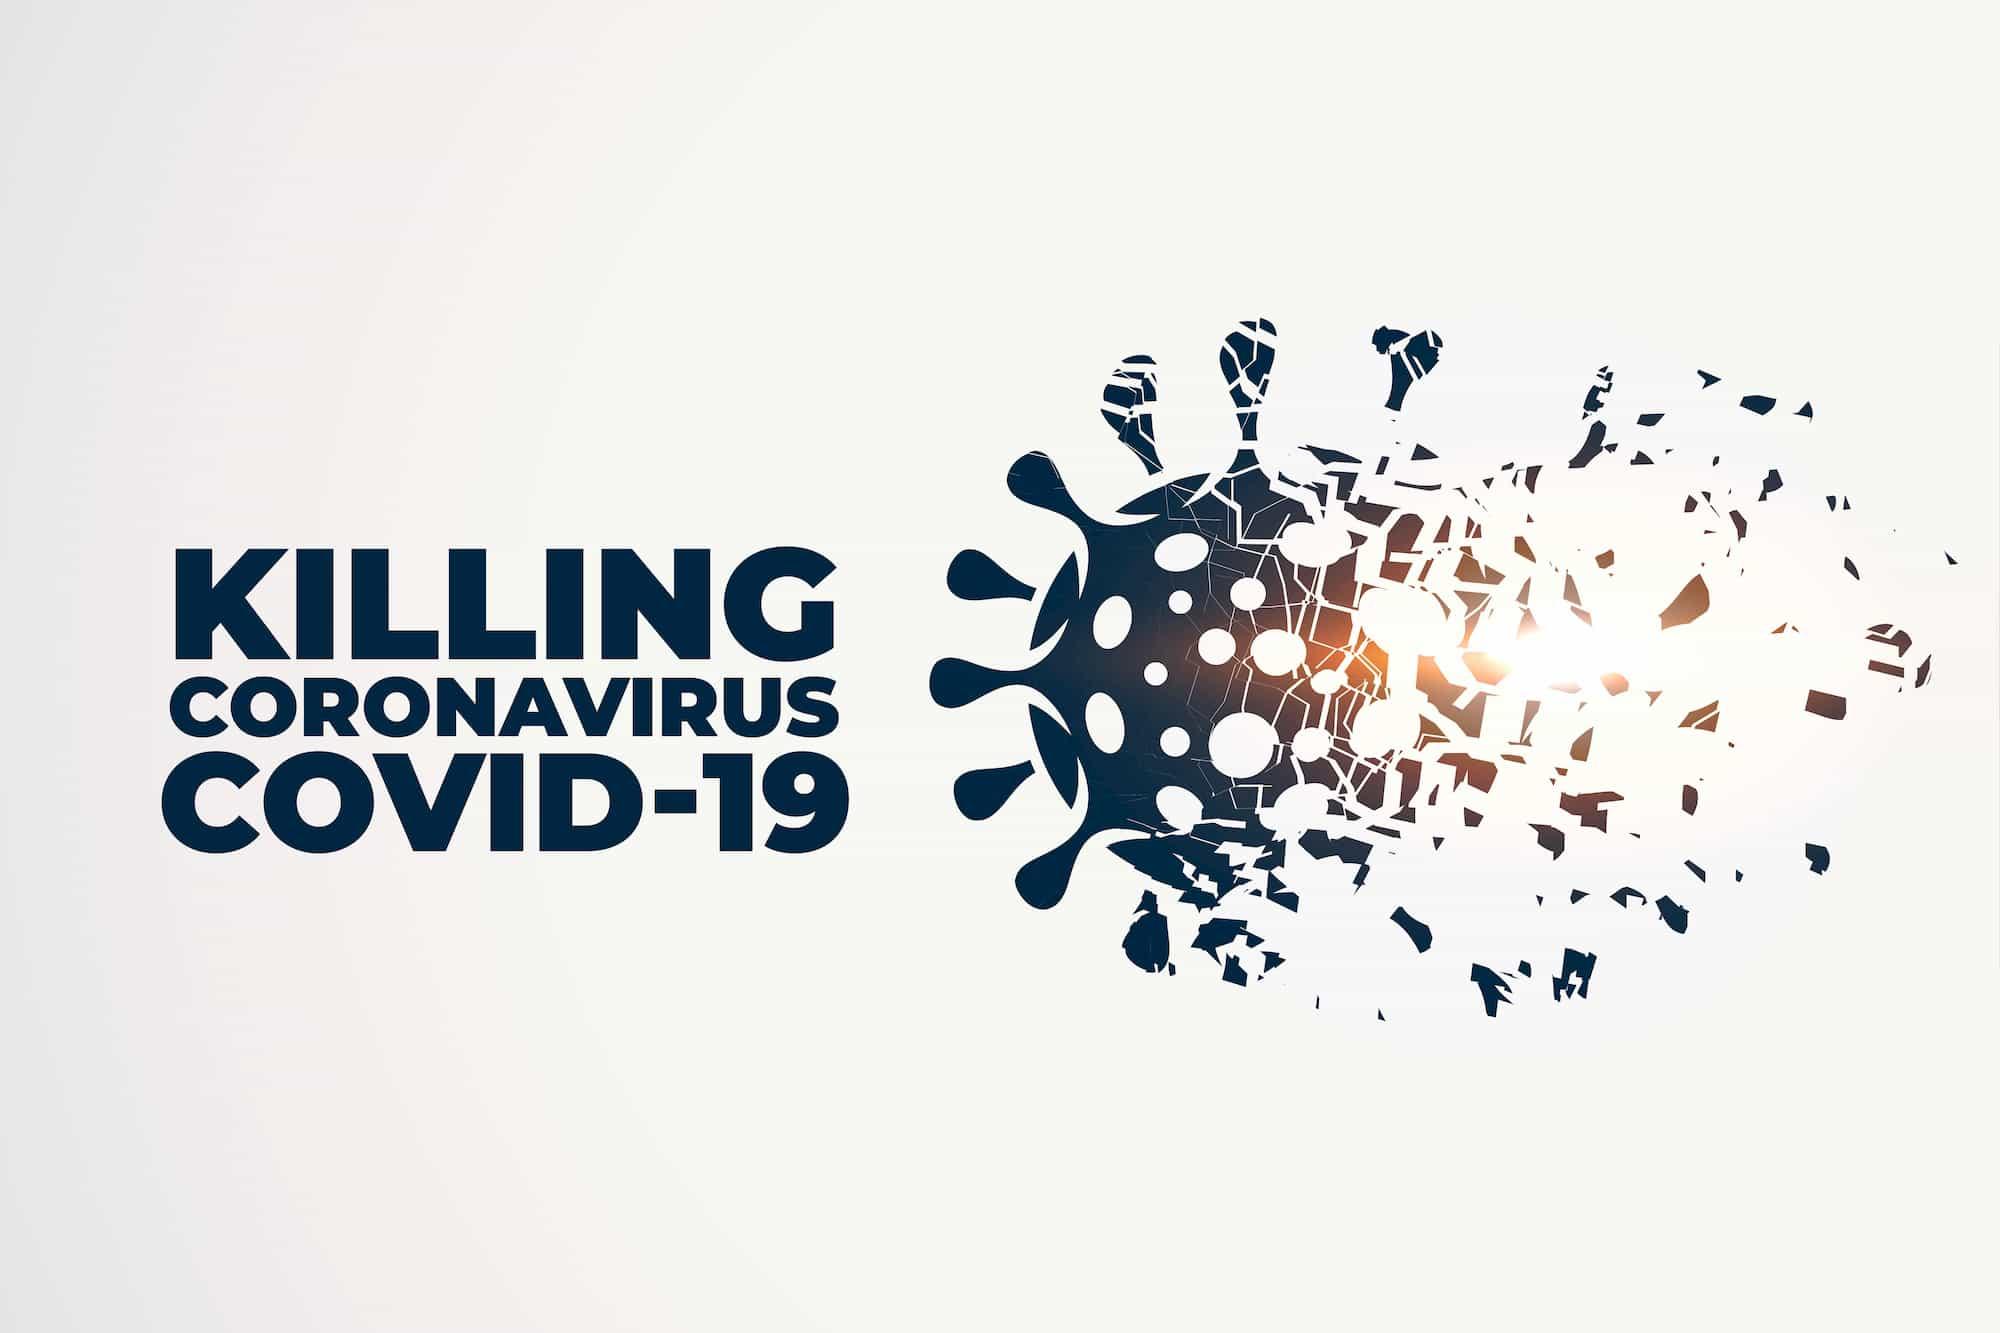 Killing COVID 19